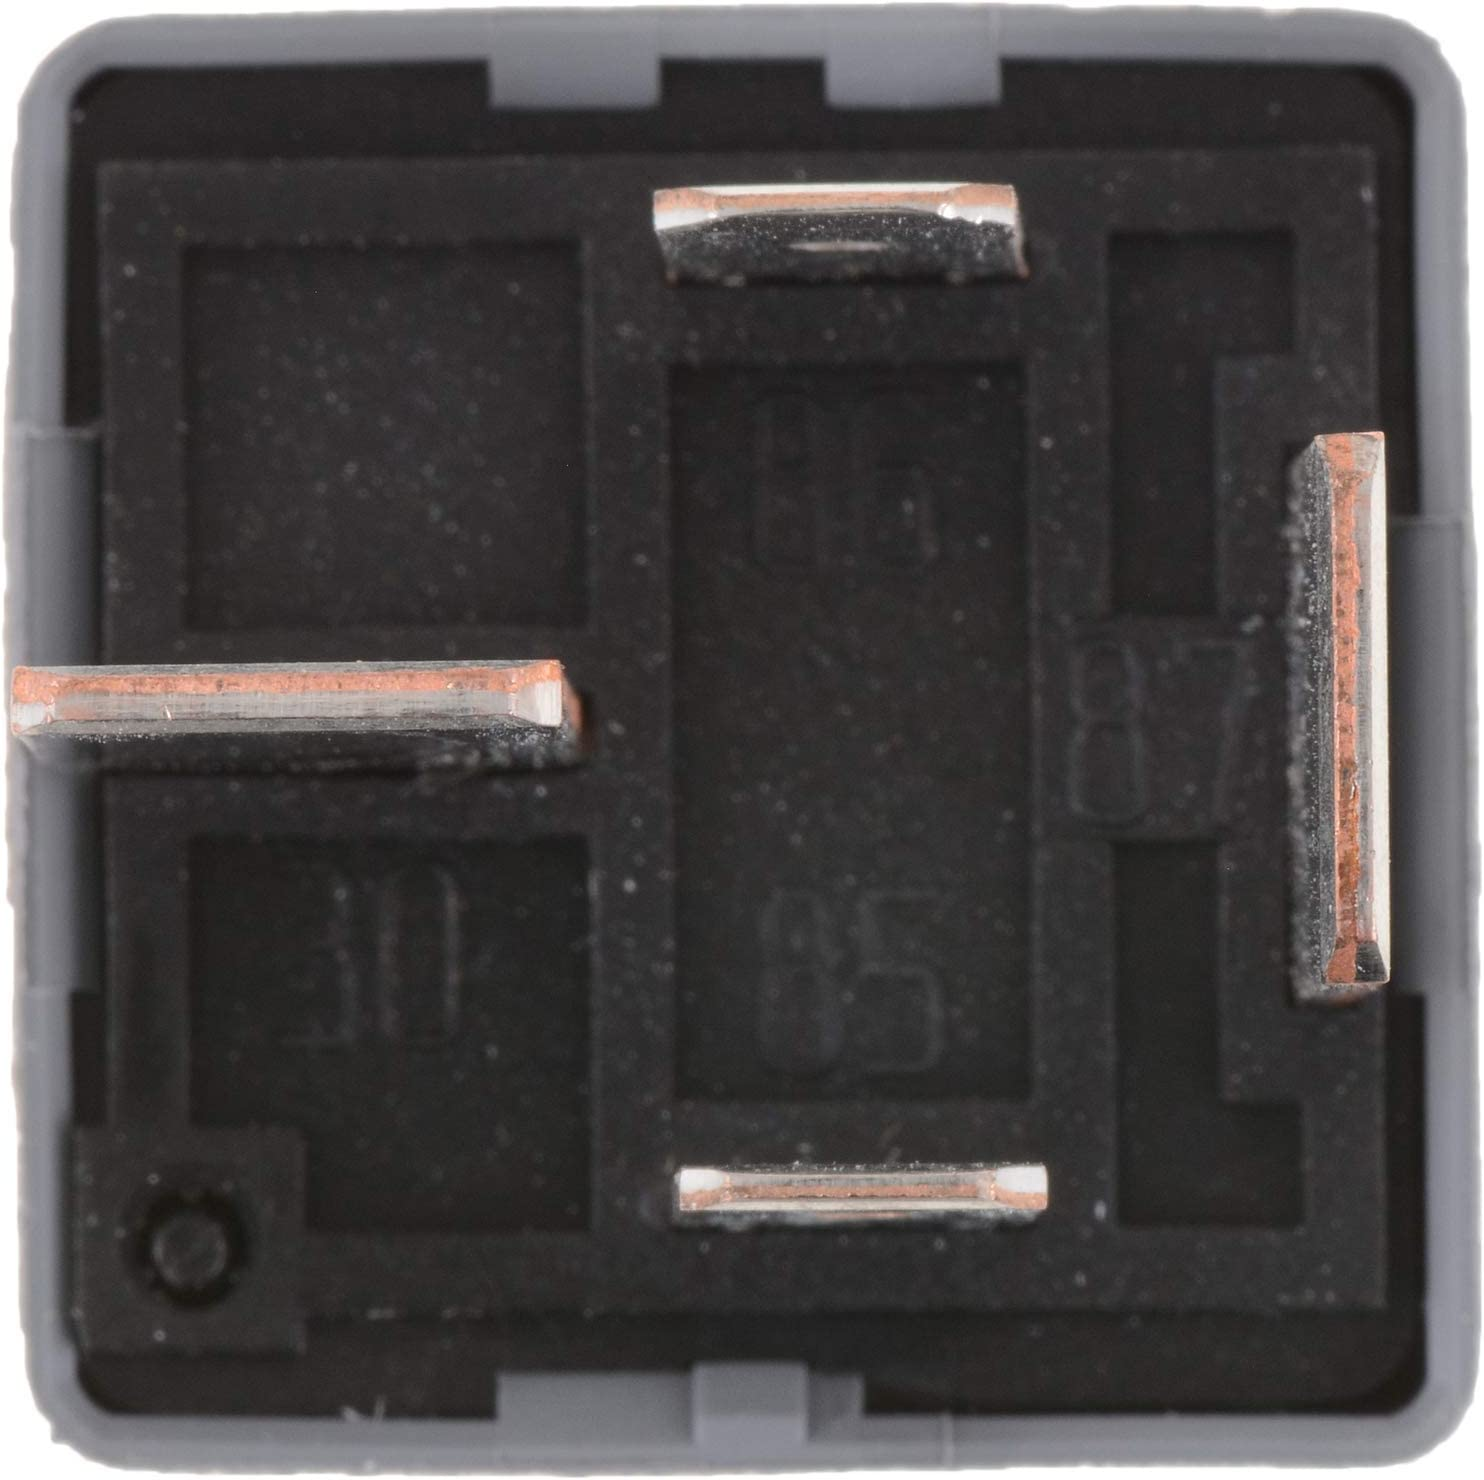 1//2; 3//4 Bosch 2 609 200 252 2500 l//h 30 Sec. pack de 1 Bomba de agua 4 m R 3//4 40 m